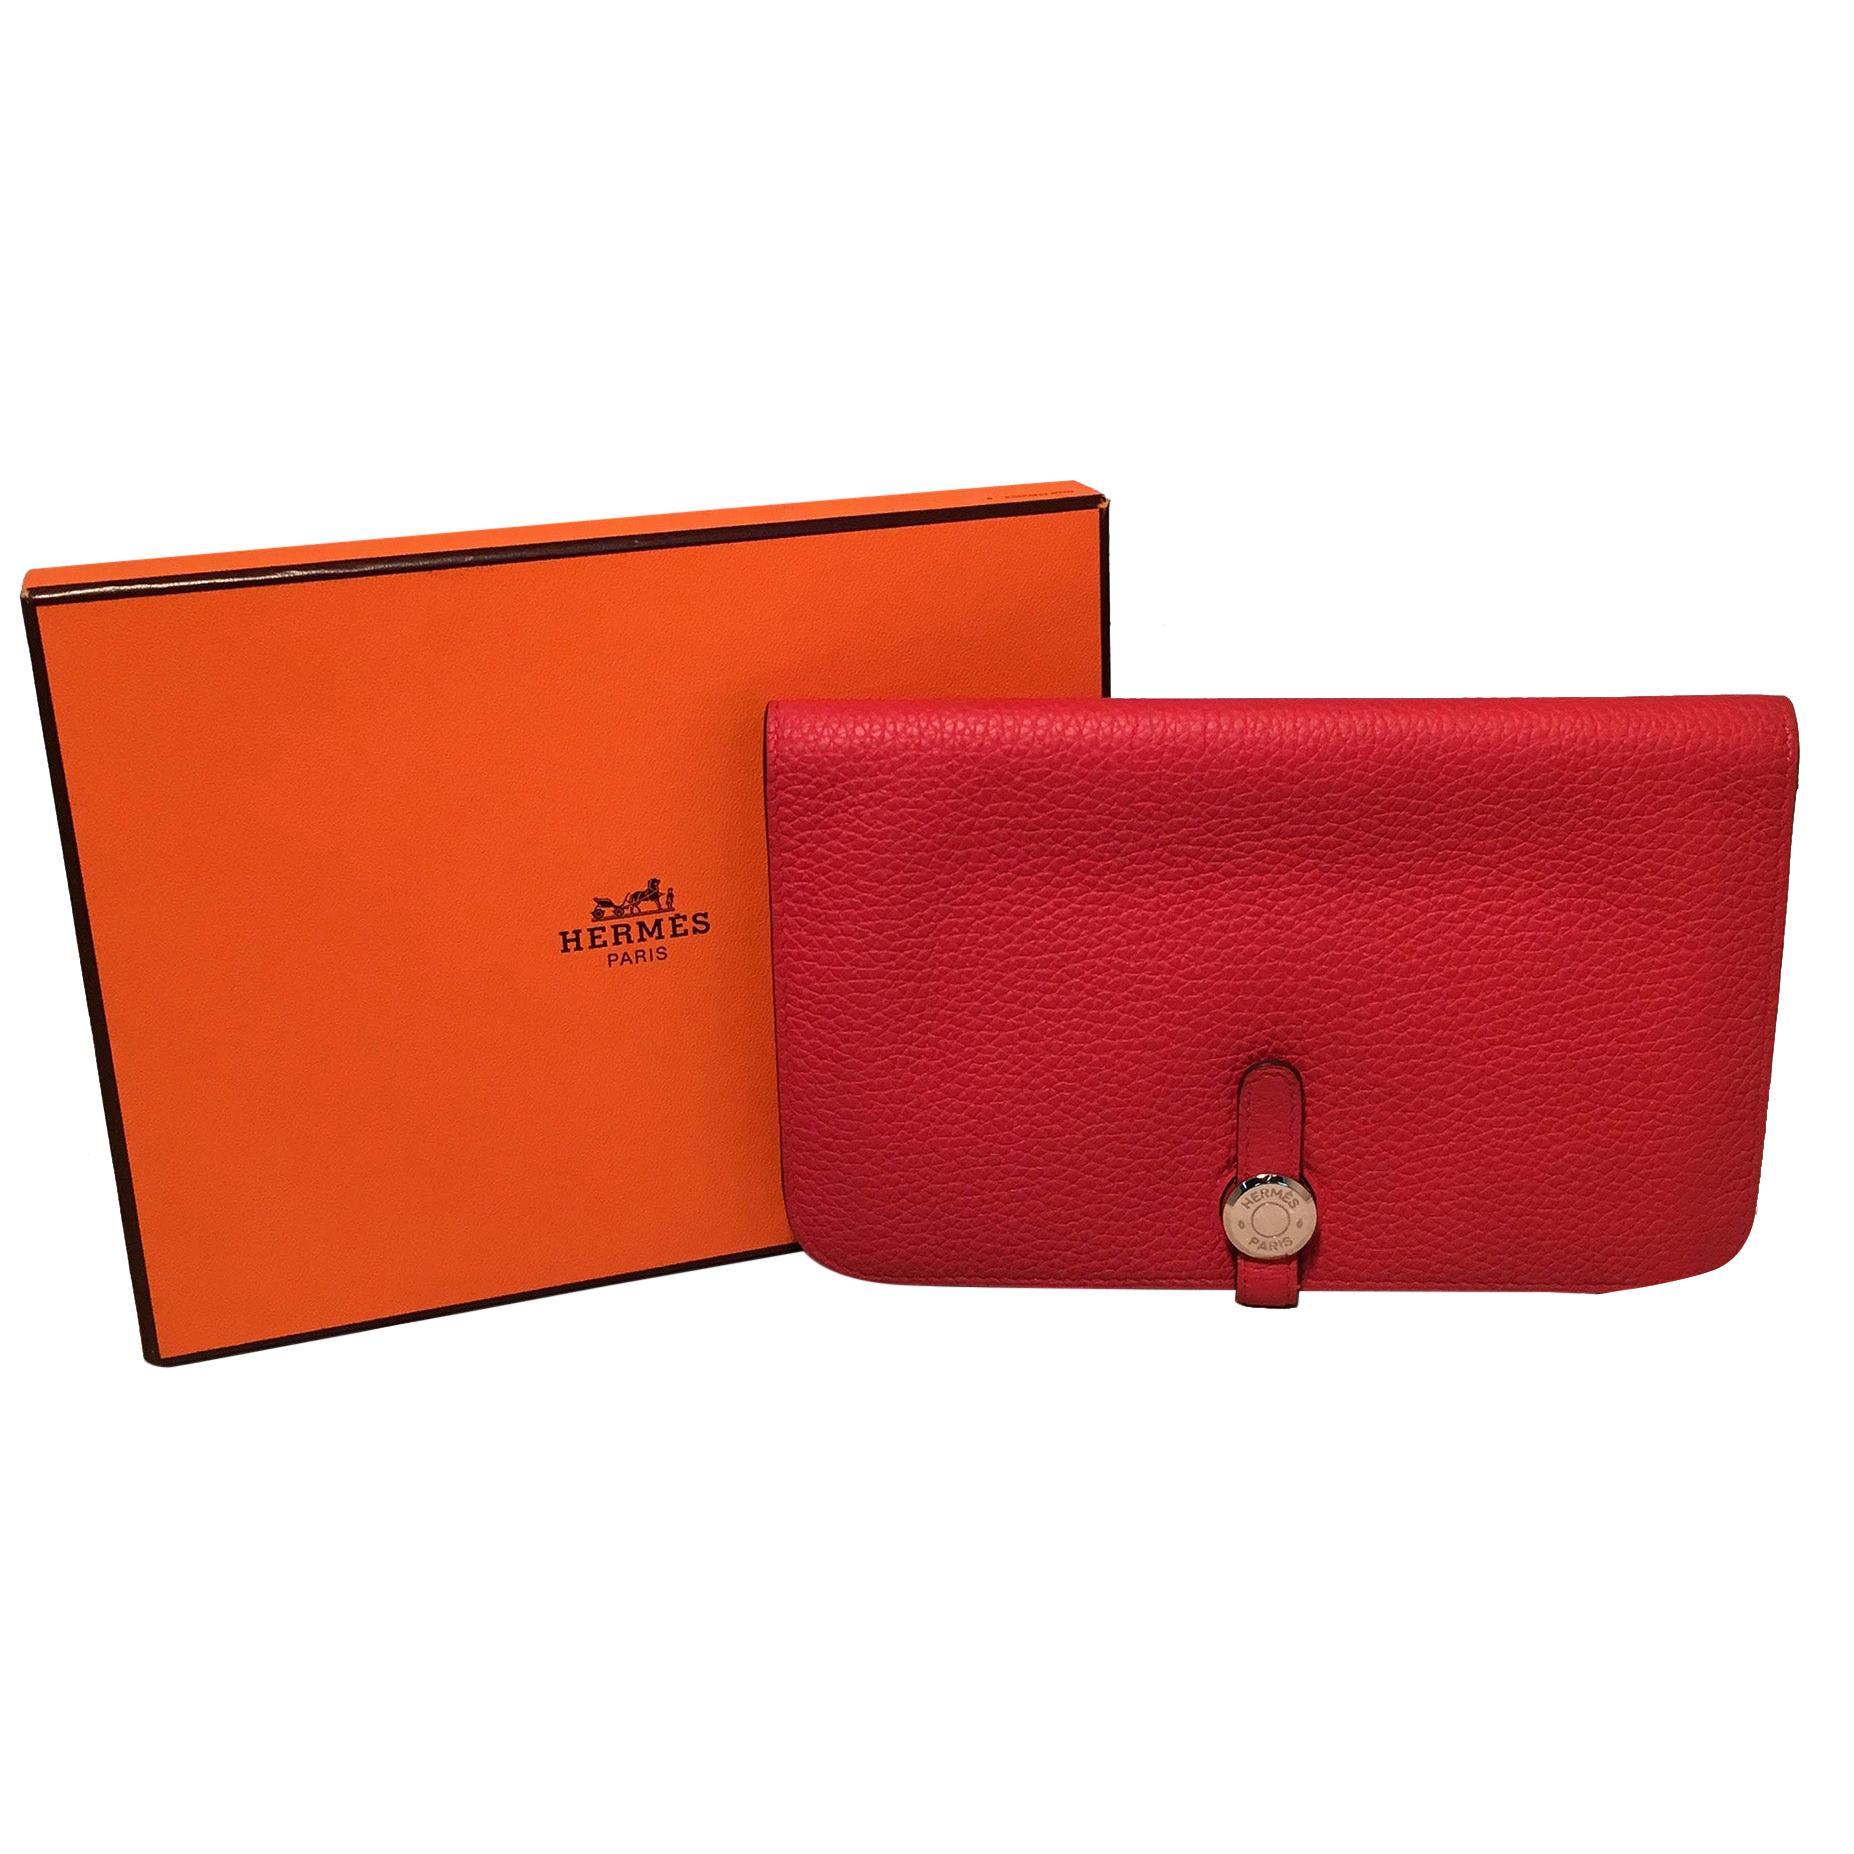 NWOT Hermes Red Togo Dogon Duo Wallet